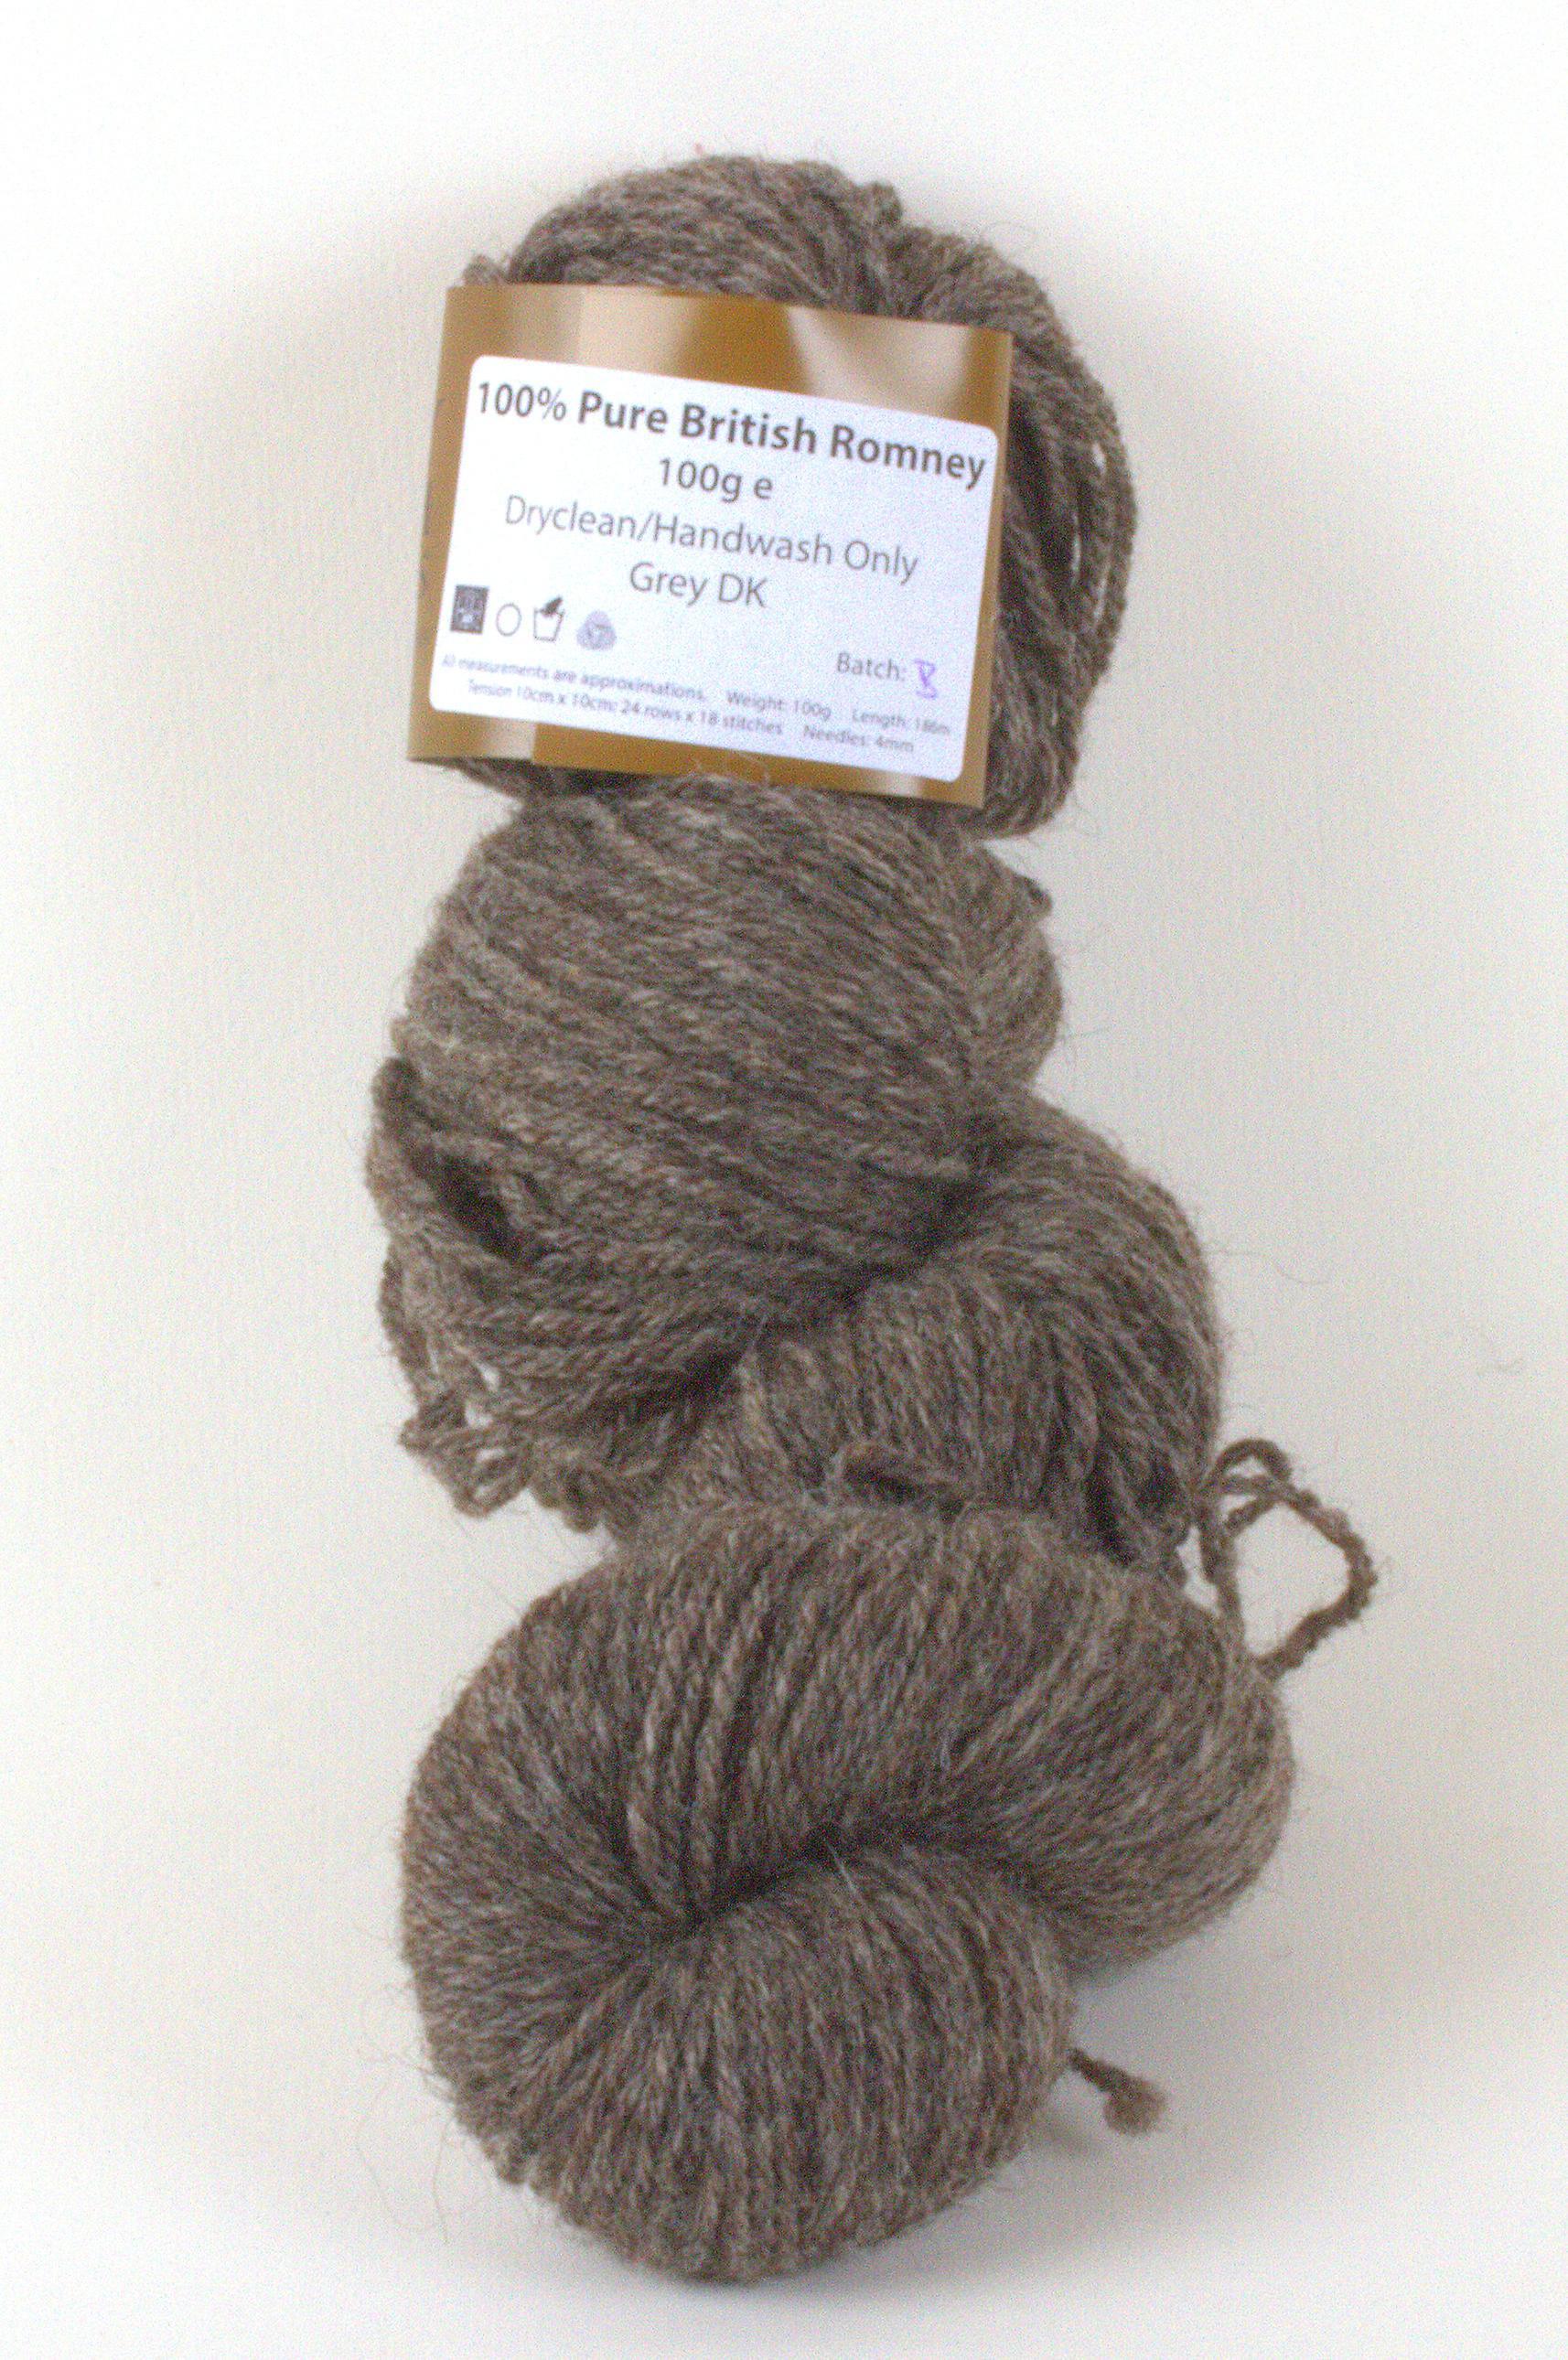 Romney Grey DK - 100g Skein Yarn